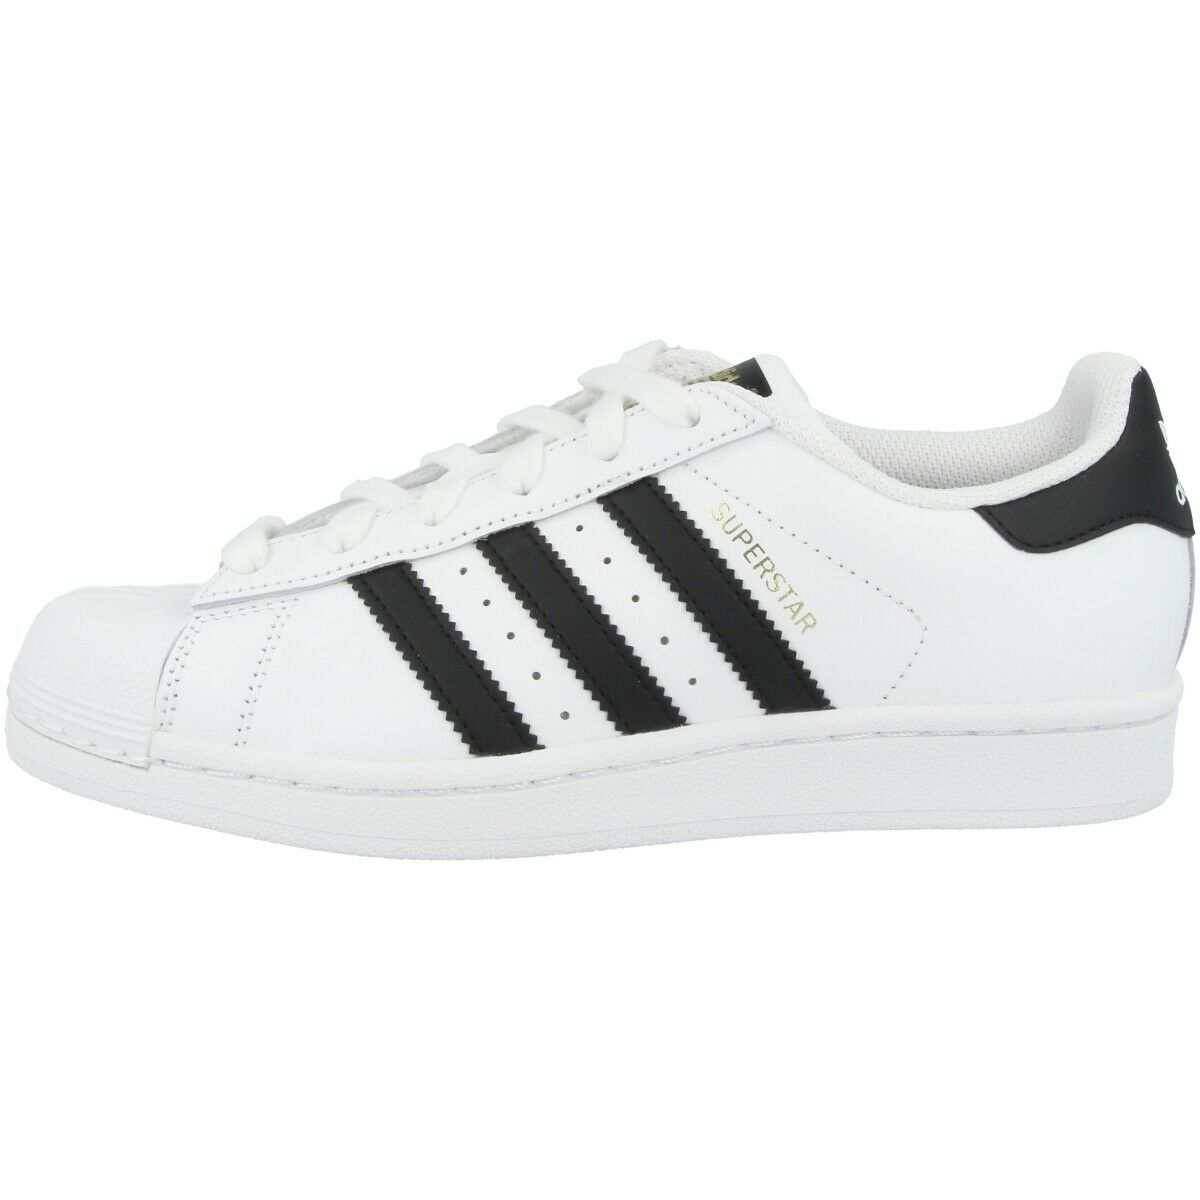 Superstar Adidas damen C77153 Weiß Turnschuhe Damen